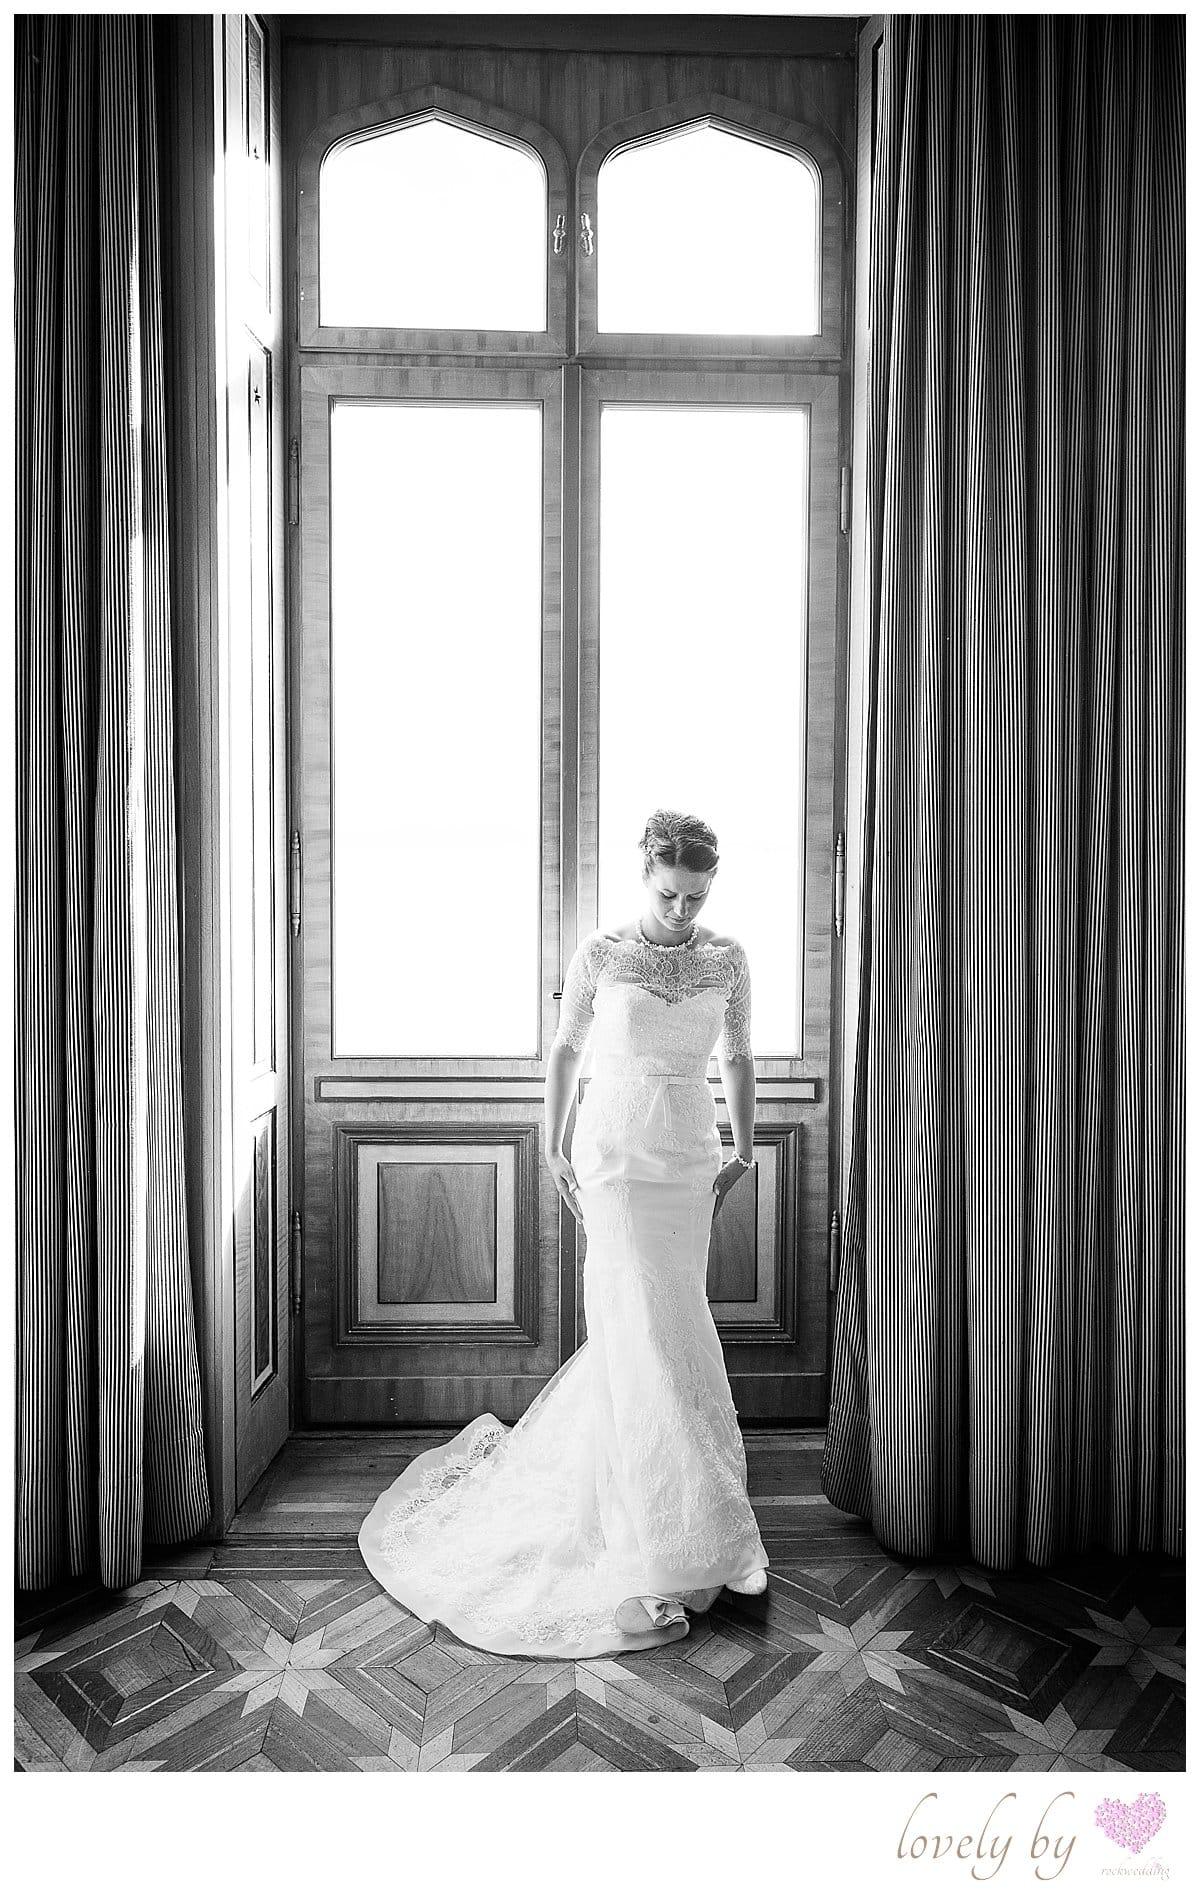 Schloss Monfort Hochzeit by rock wedding